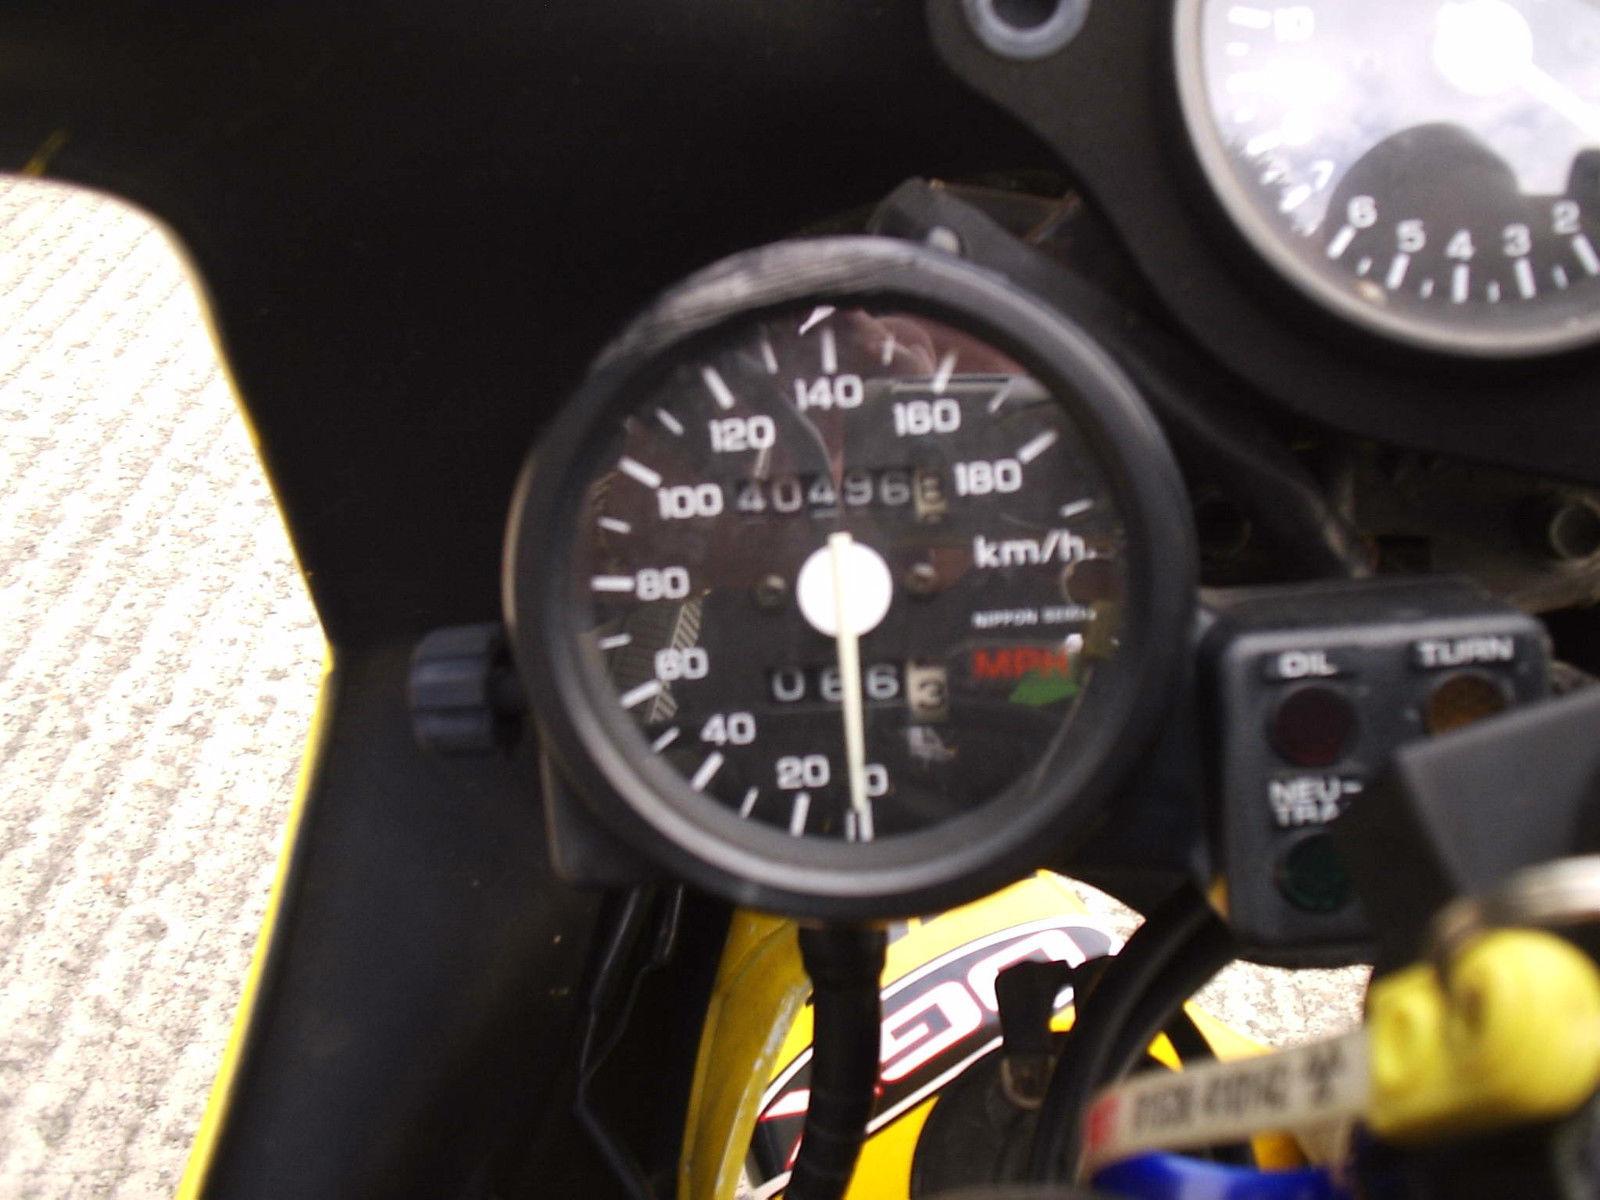 Wheel Refurbishment Near Me >> HONDA VFR400 NC30 ROSSI REPLICA